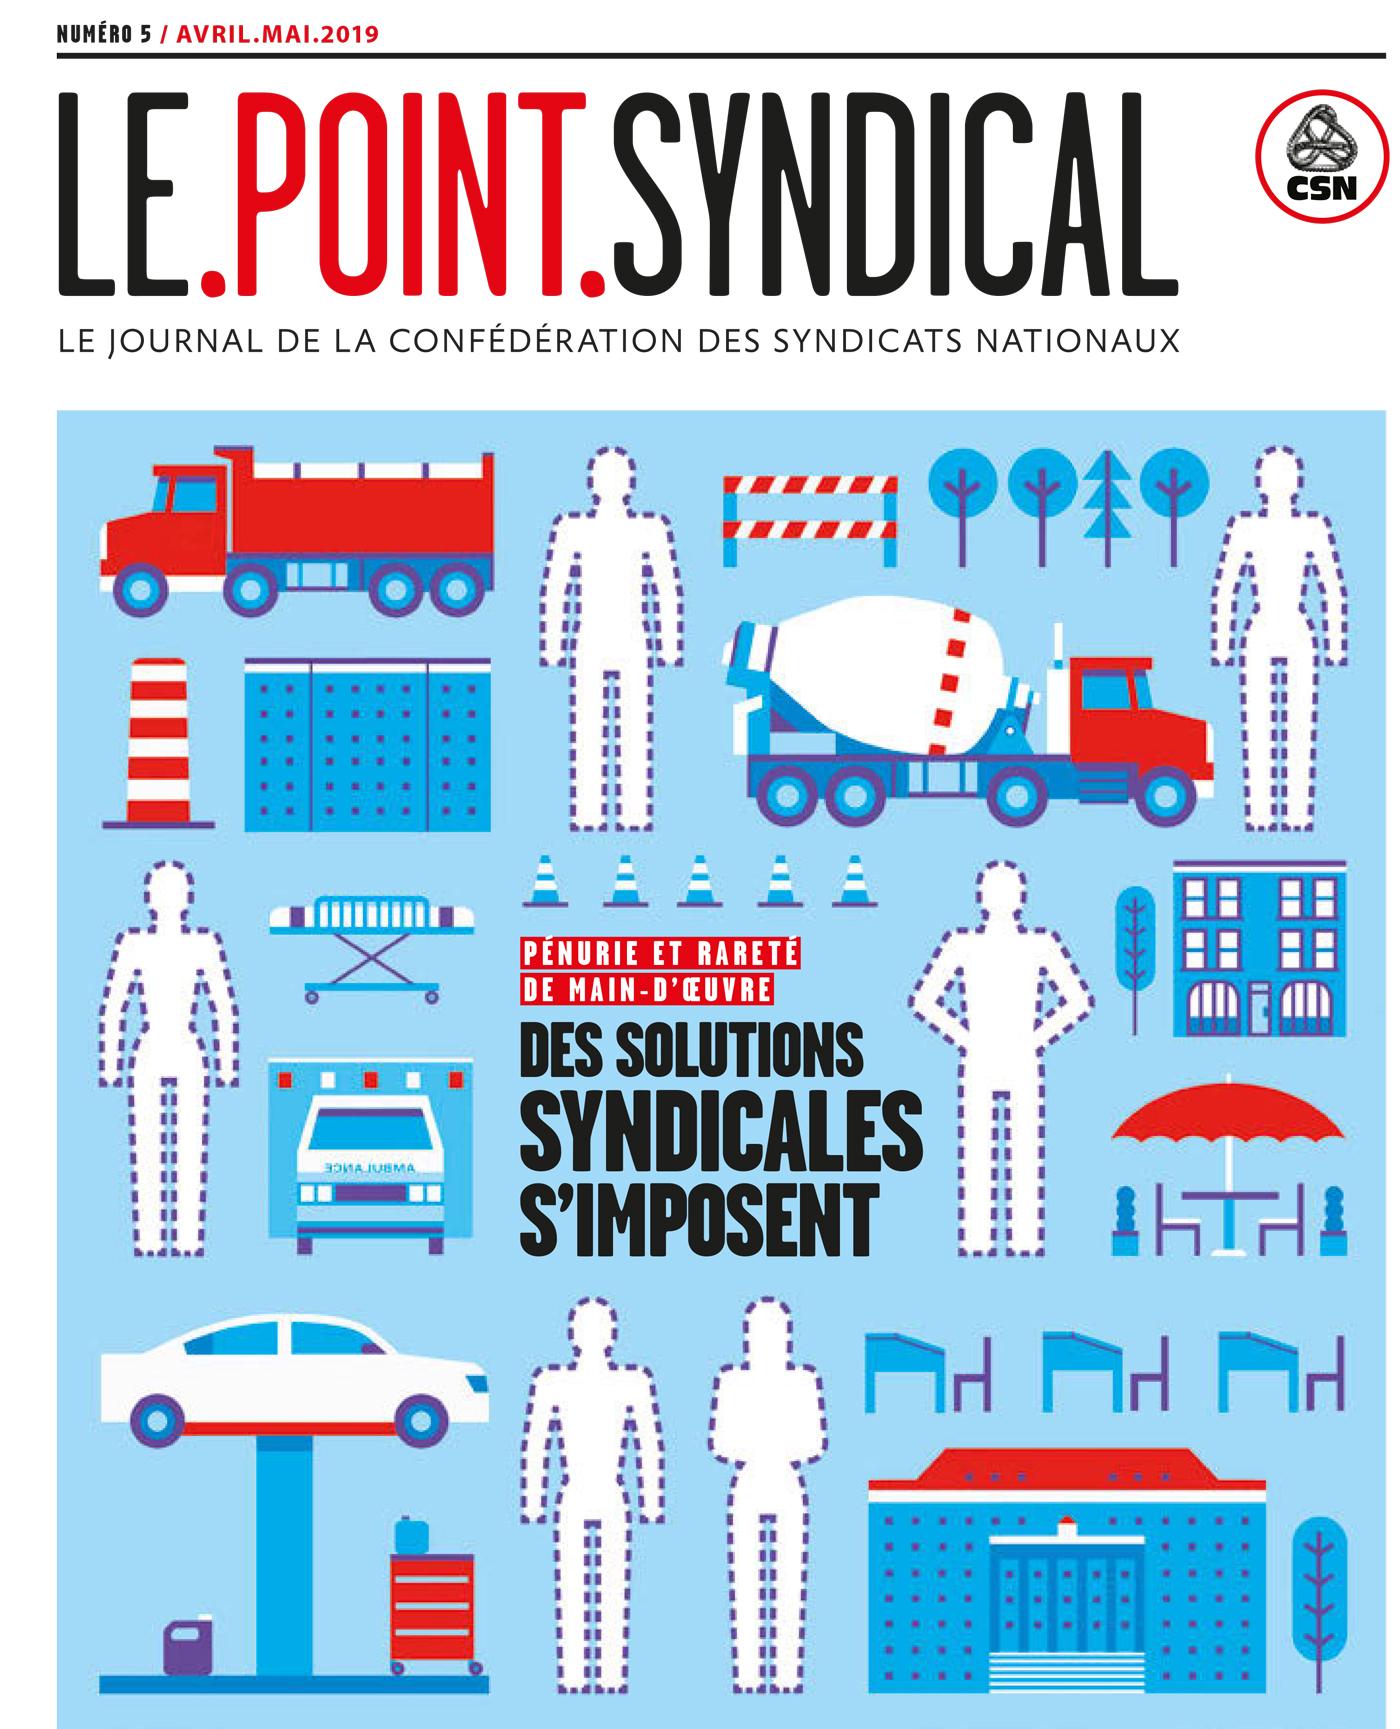 Le Point Syndical Numéro 5